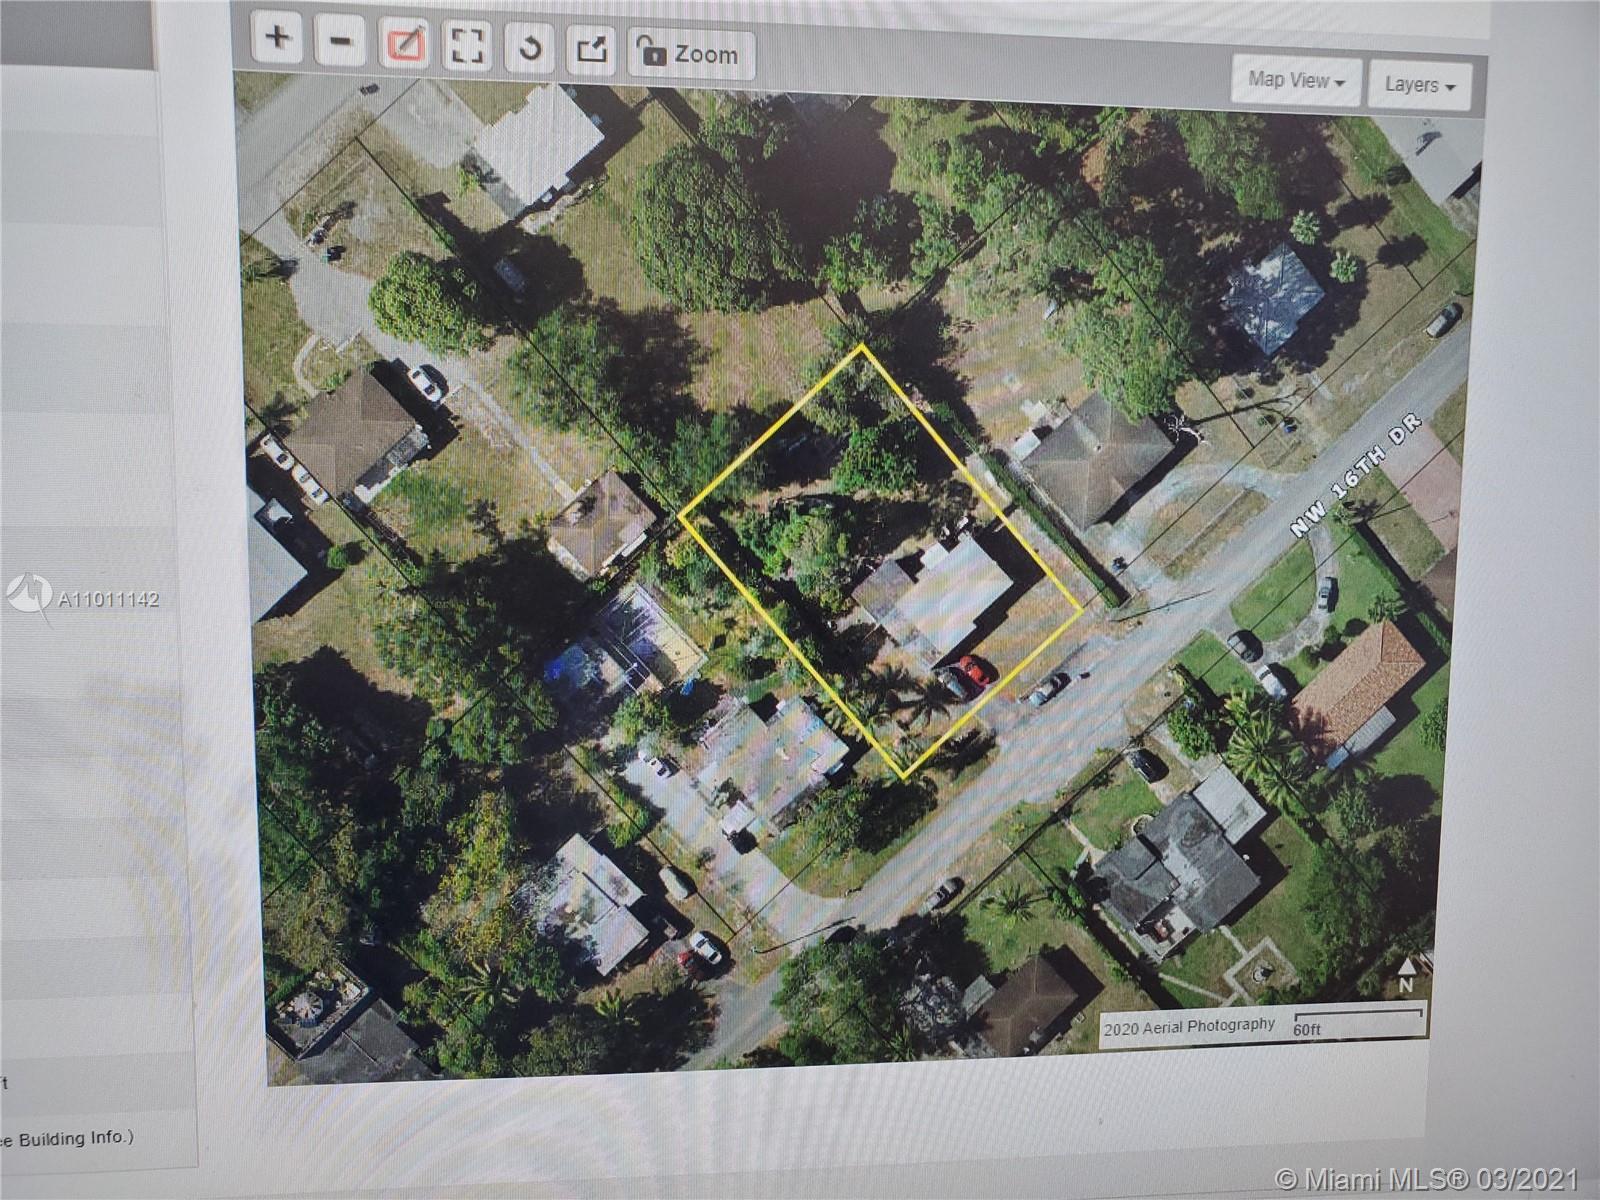 Bisc Gardens - 14860 NW 16 DR, Miami, FL 33167